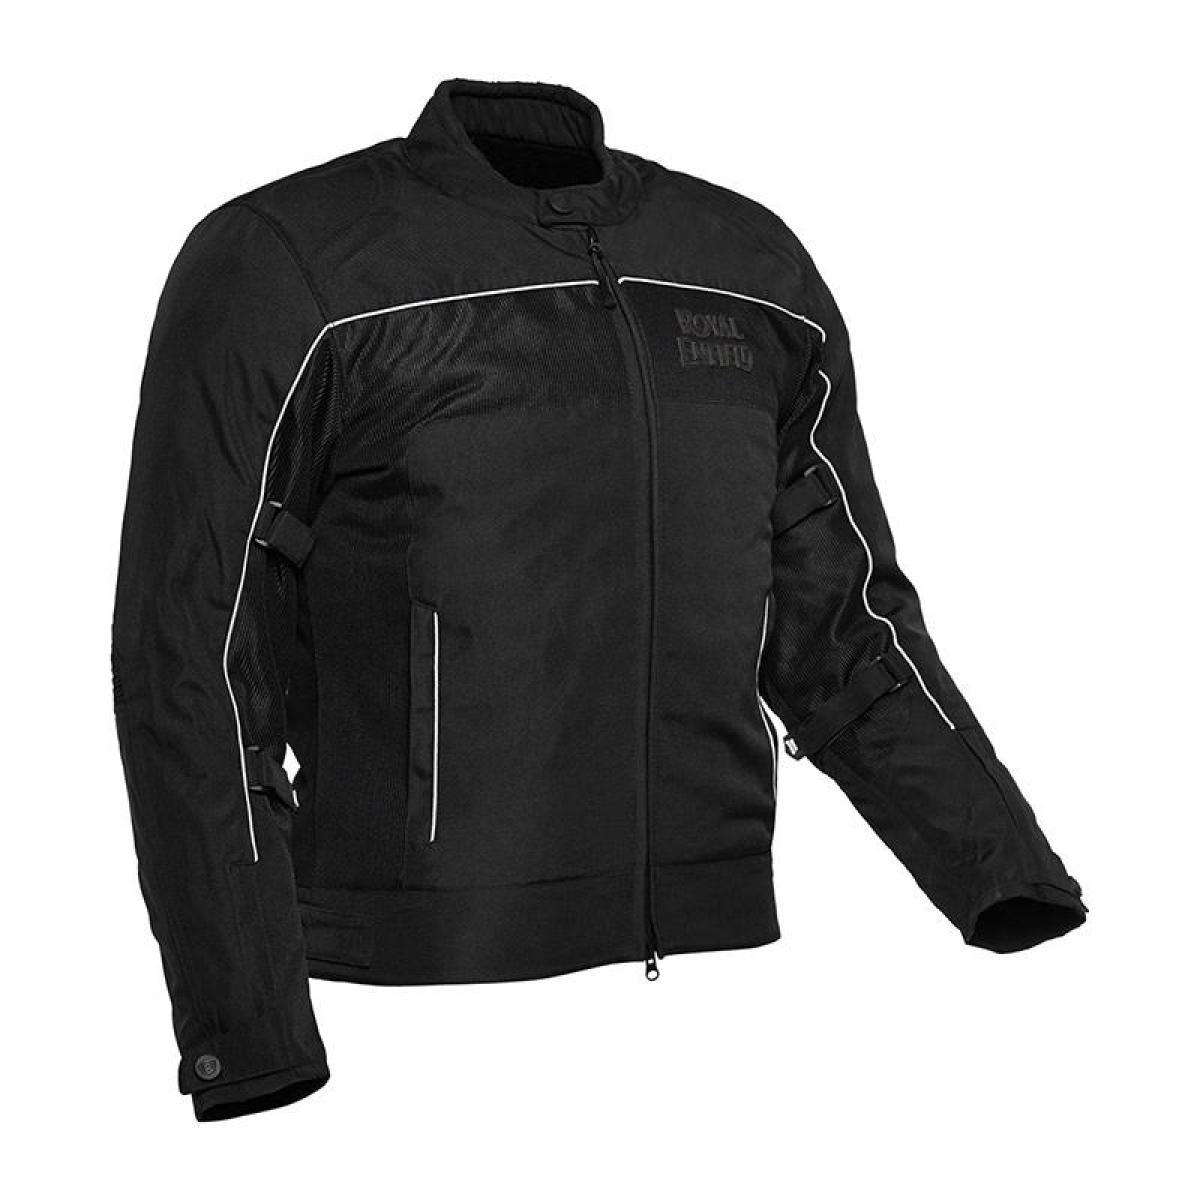 Adventure gear essentials : Royal Enfield Explorer V2 Jacket